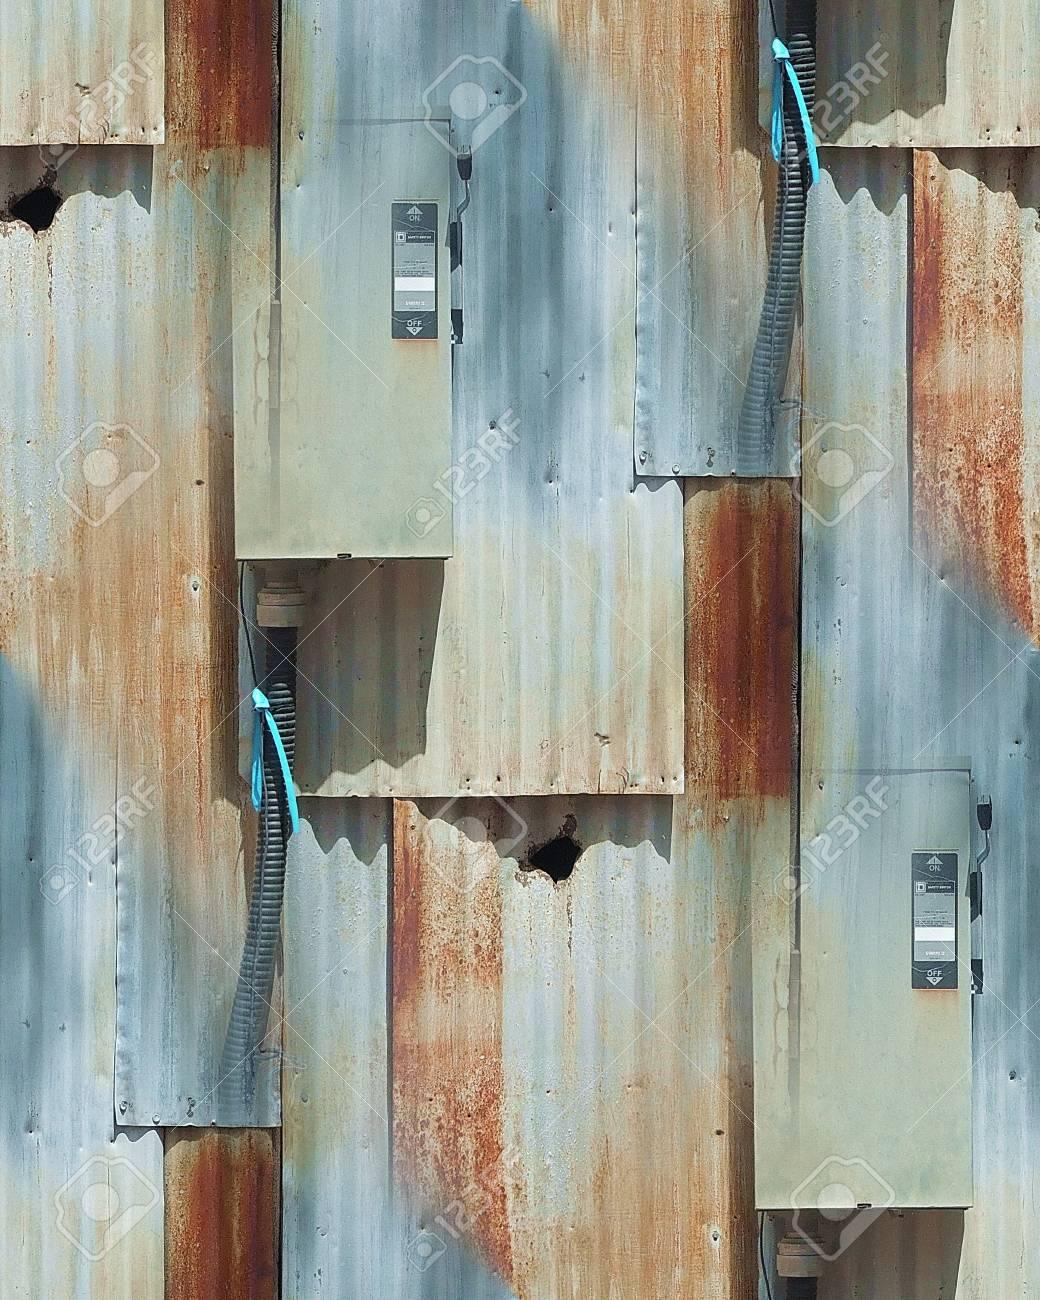 Rusted Metallic Siding Seamless Repeating Pattern Stock Photo - 54780771